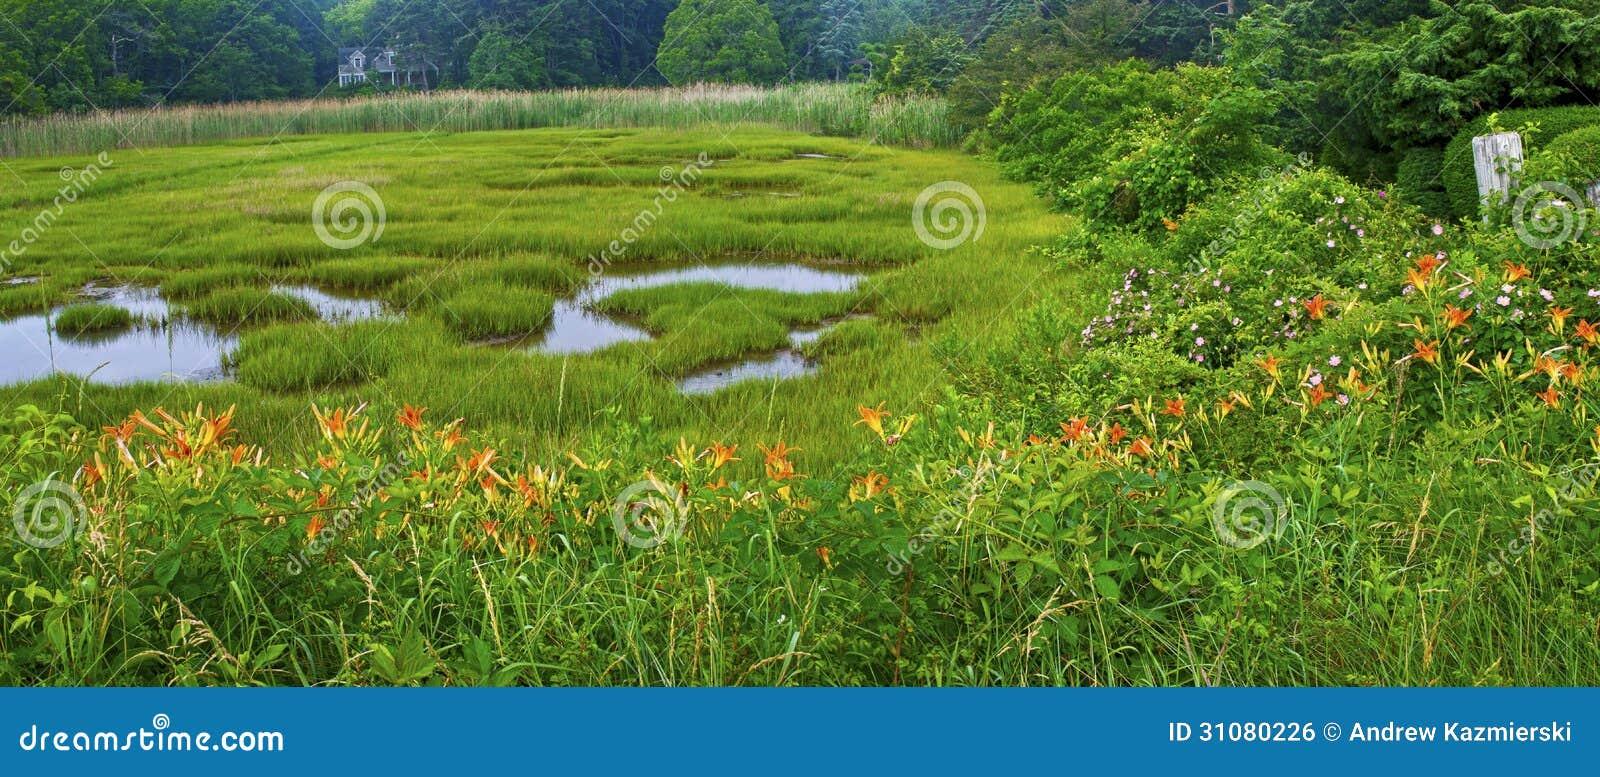 Massachusetts Wetland Panorama Royalty Free Stock Image